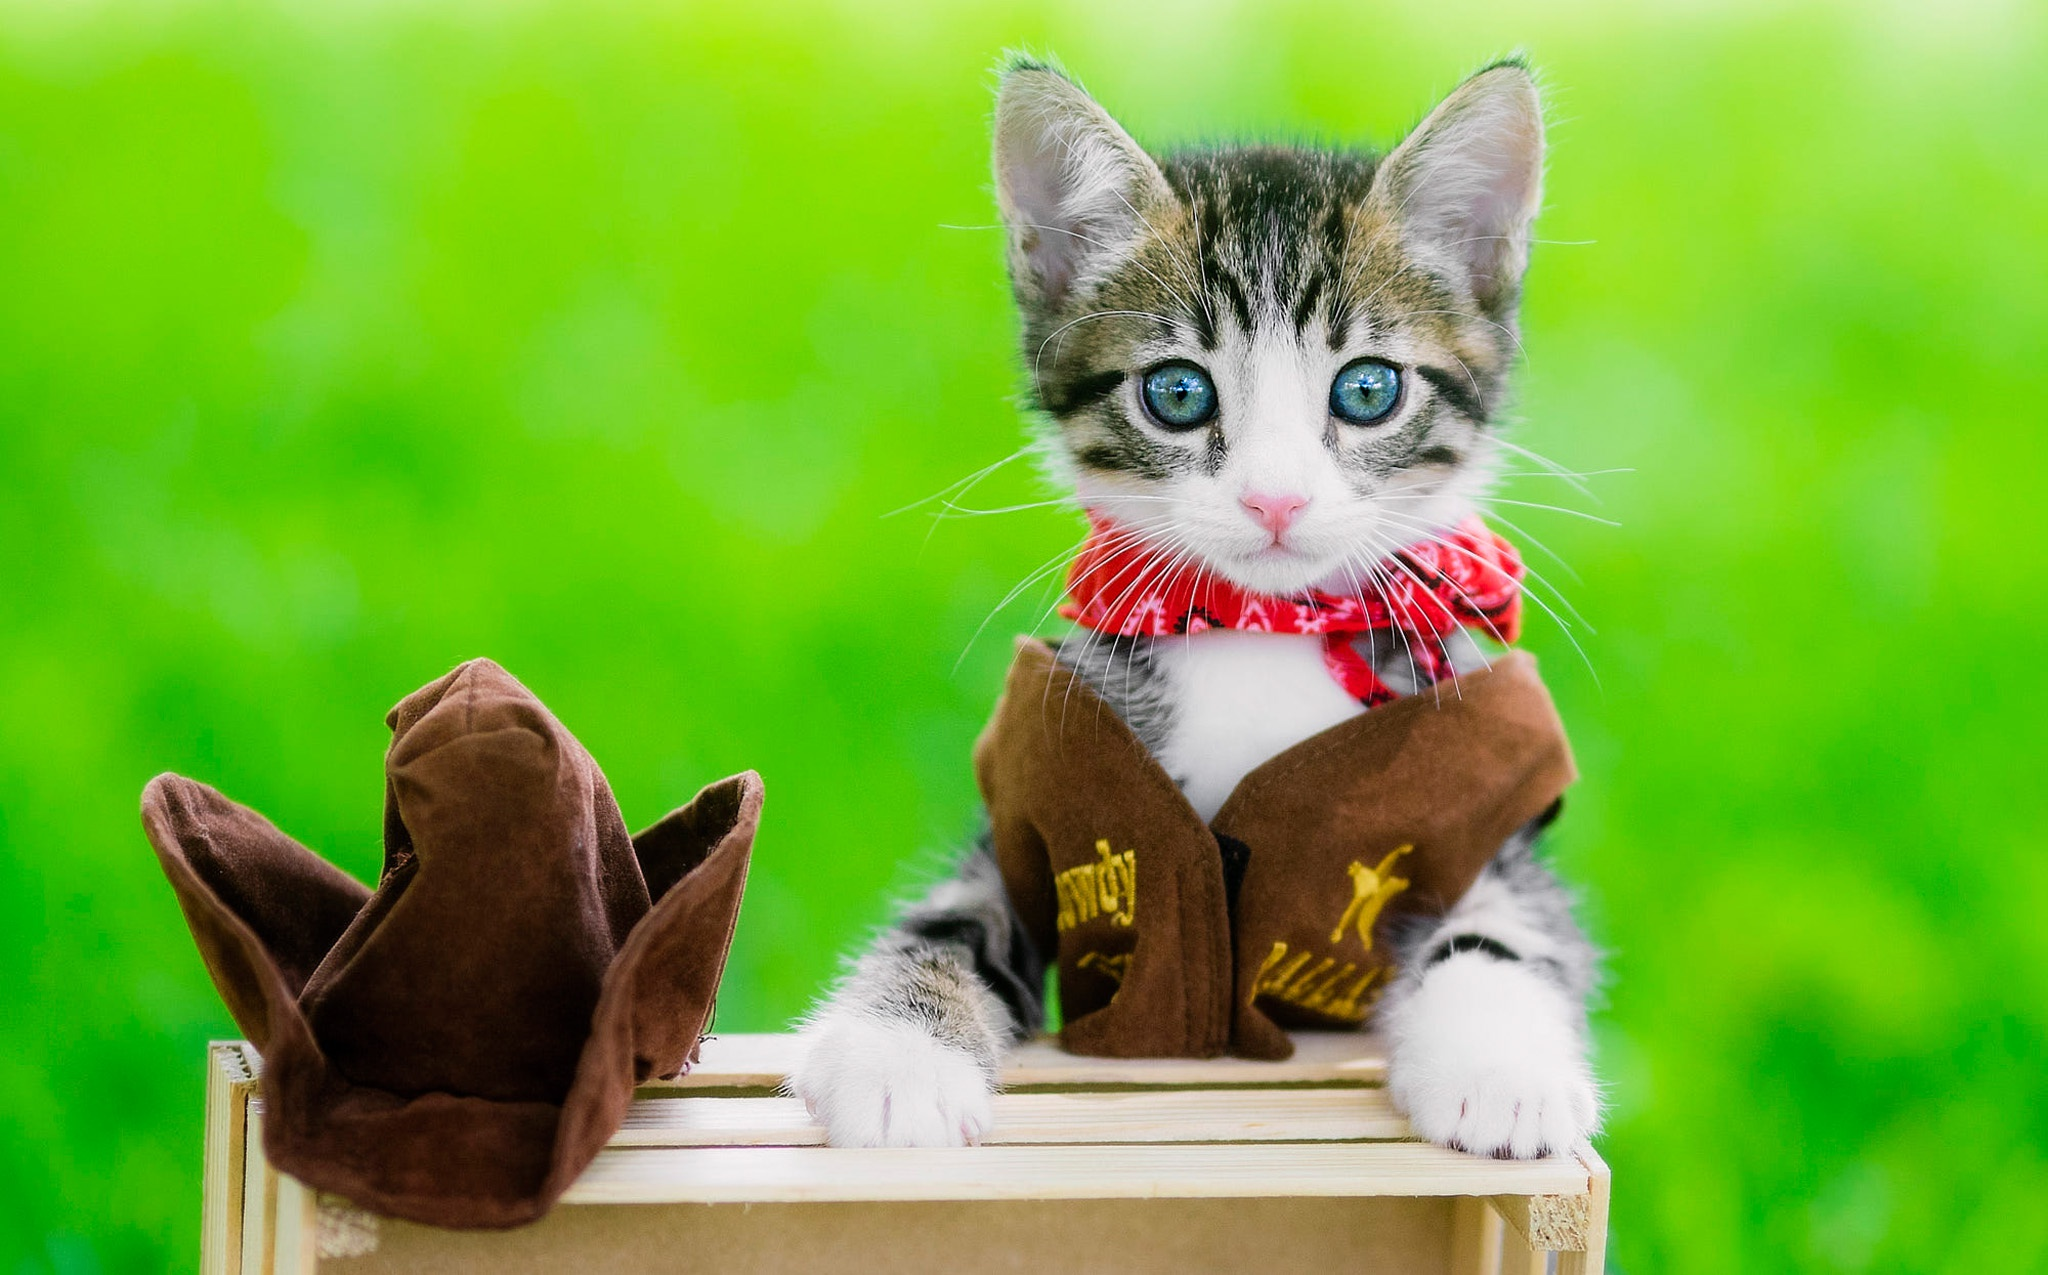 cowgirl cat.jpg